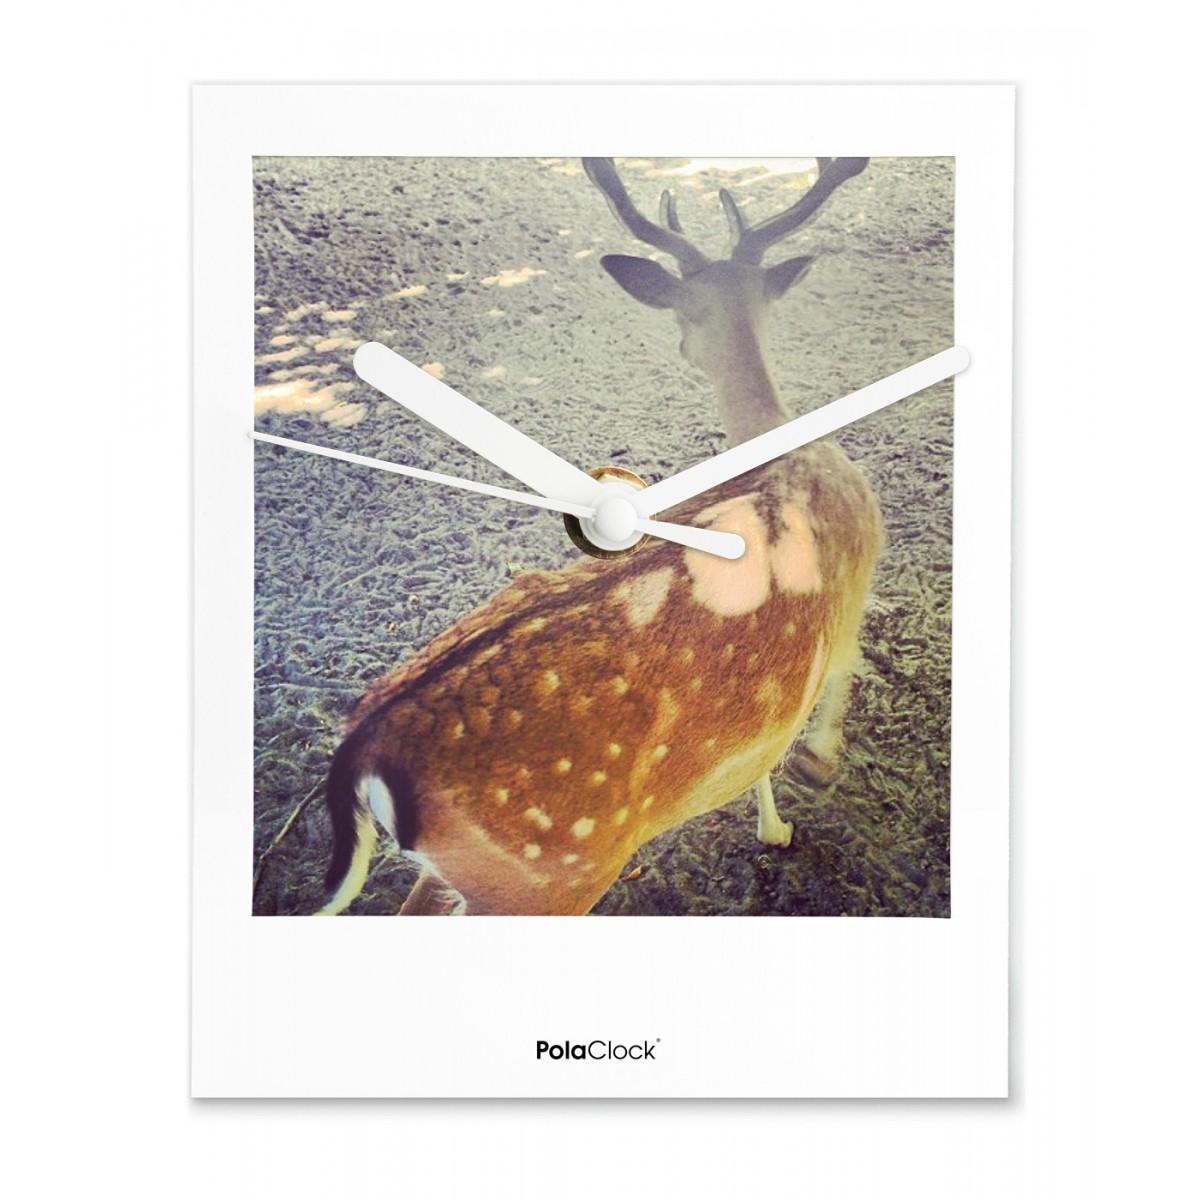 "PolaClock ""WHO KILLED BAMBI"" Wanduhr / Tischuhr im Polaroid-Look by Marcell Kochert"